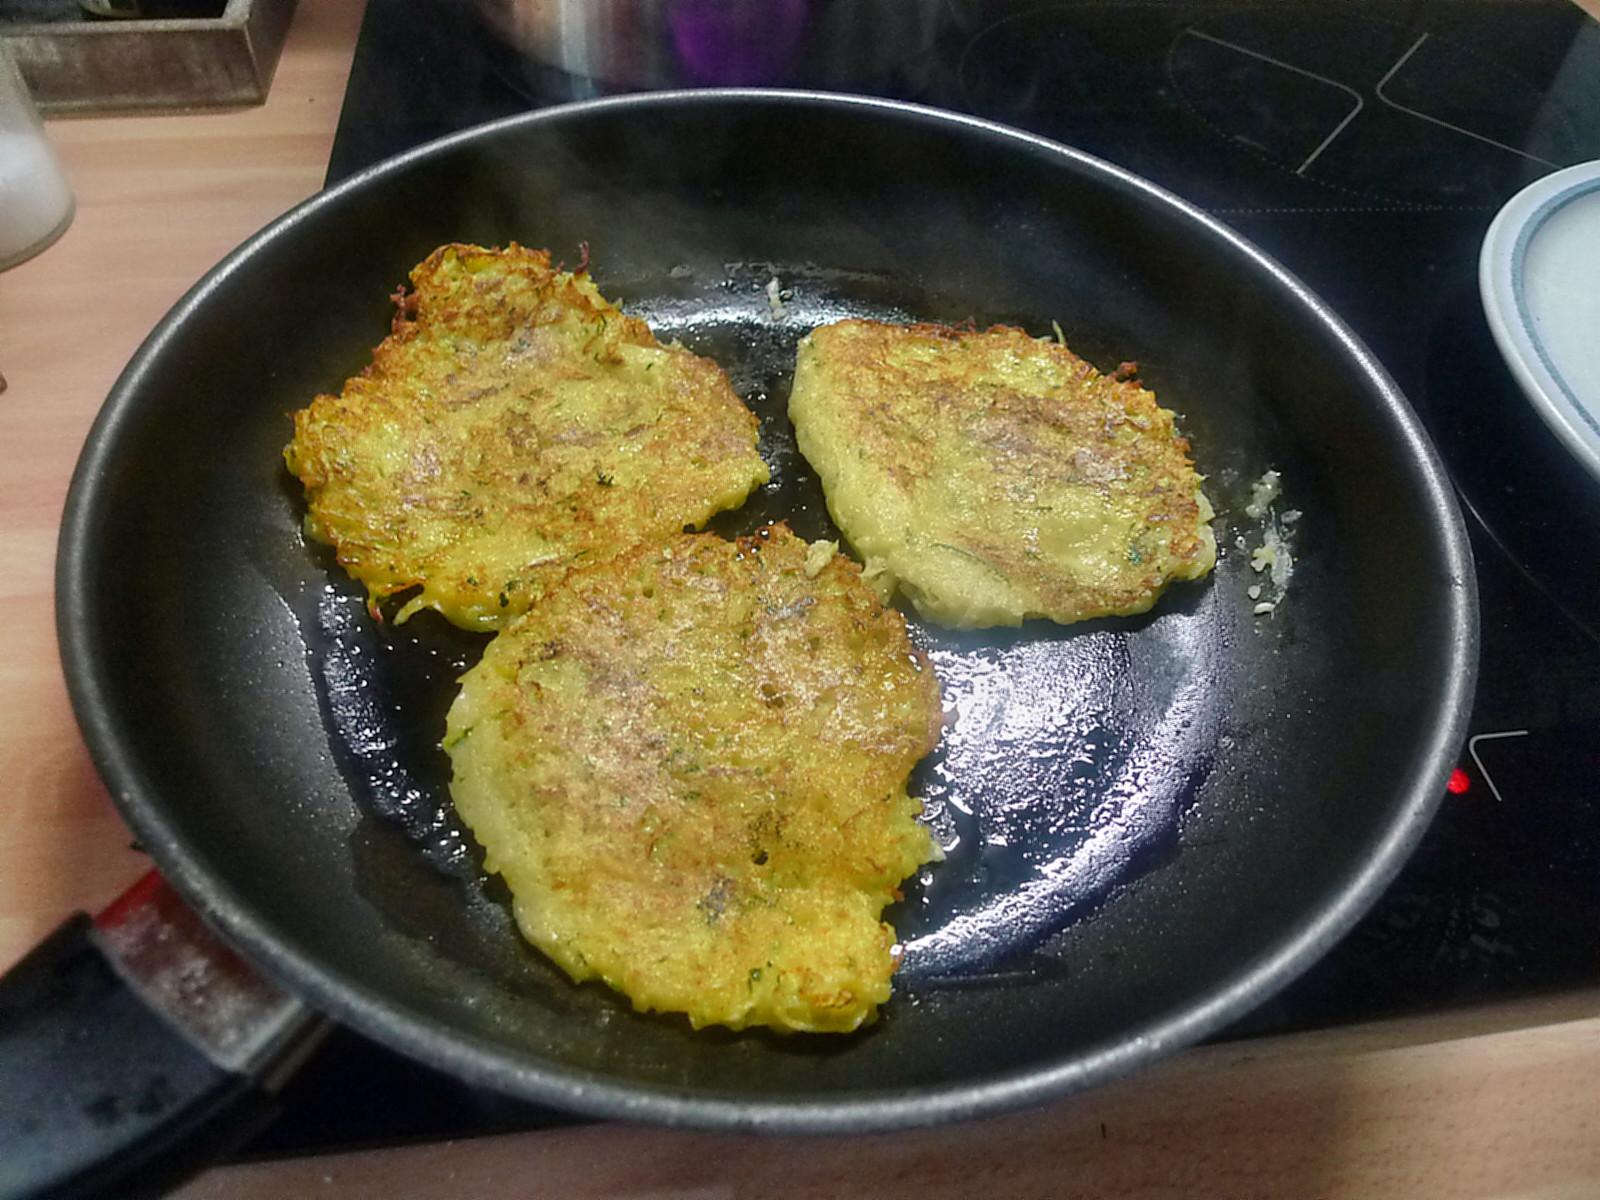 Zucchini-Kartoffelpuffer-26.7.14   (8)